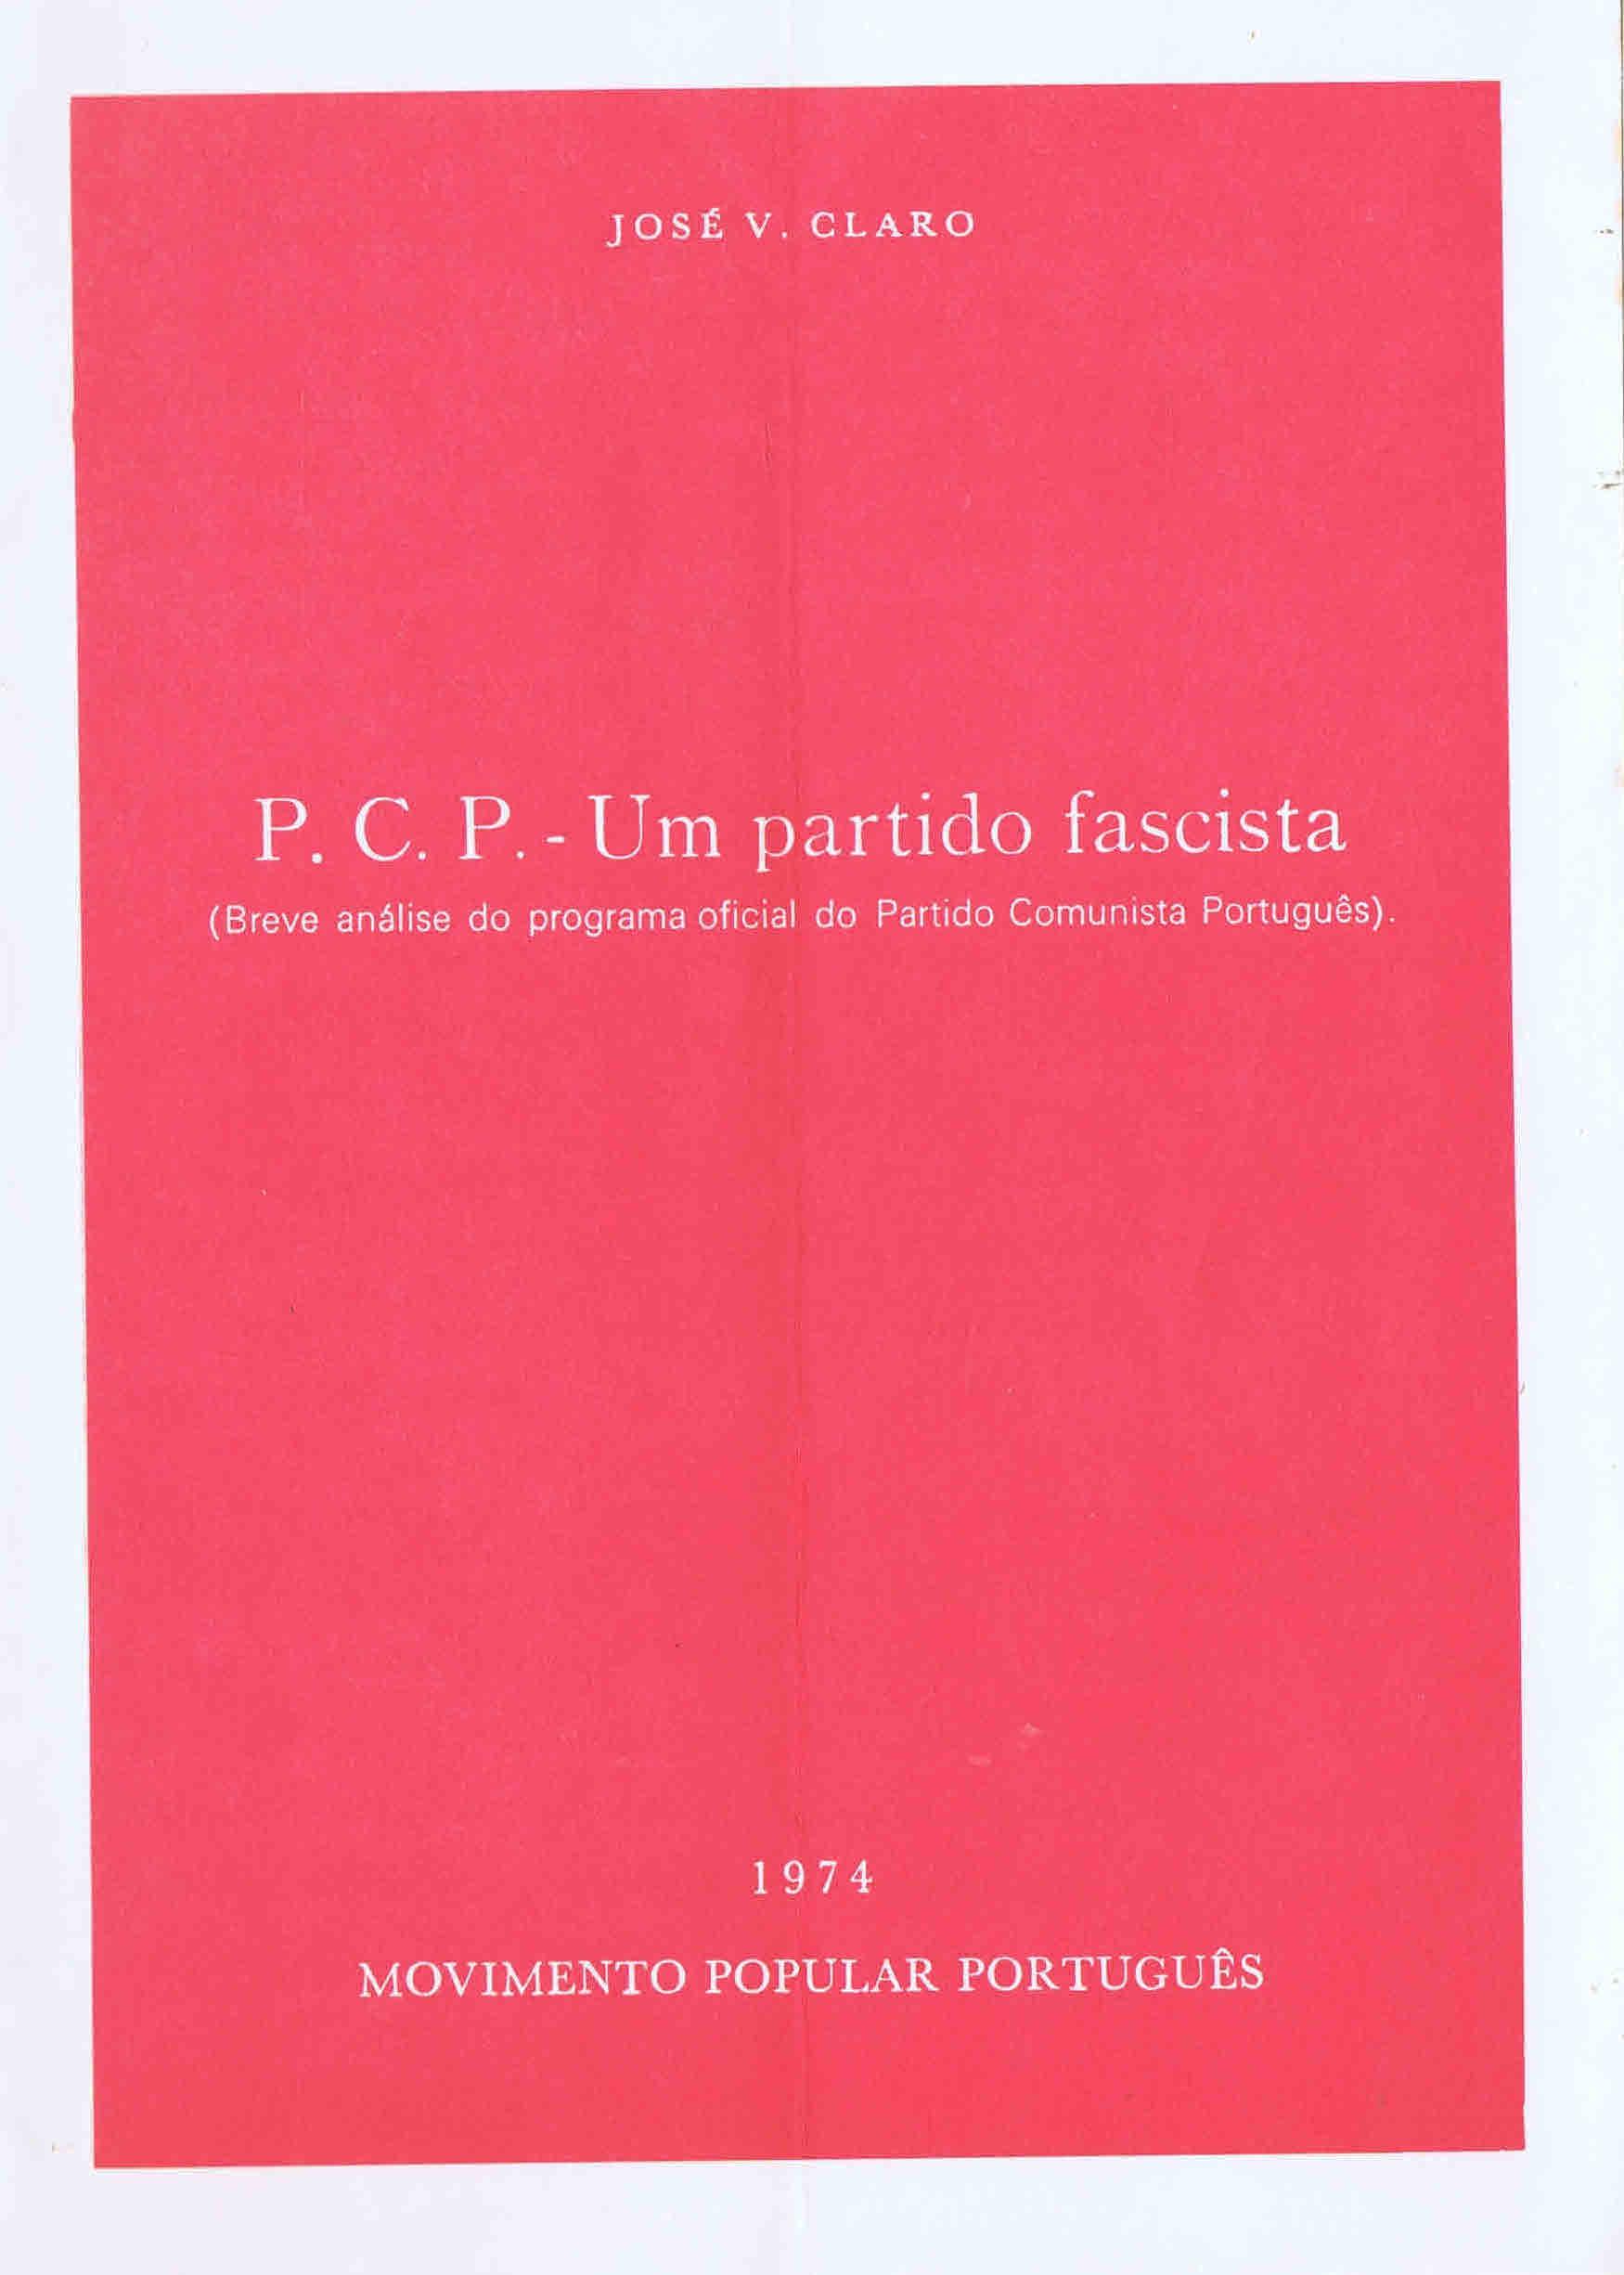 Copy of Documerrnt (190)